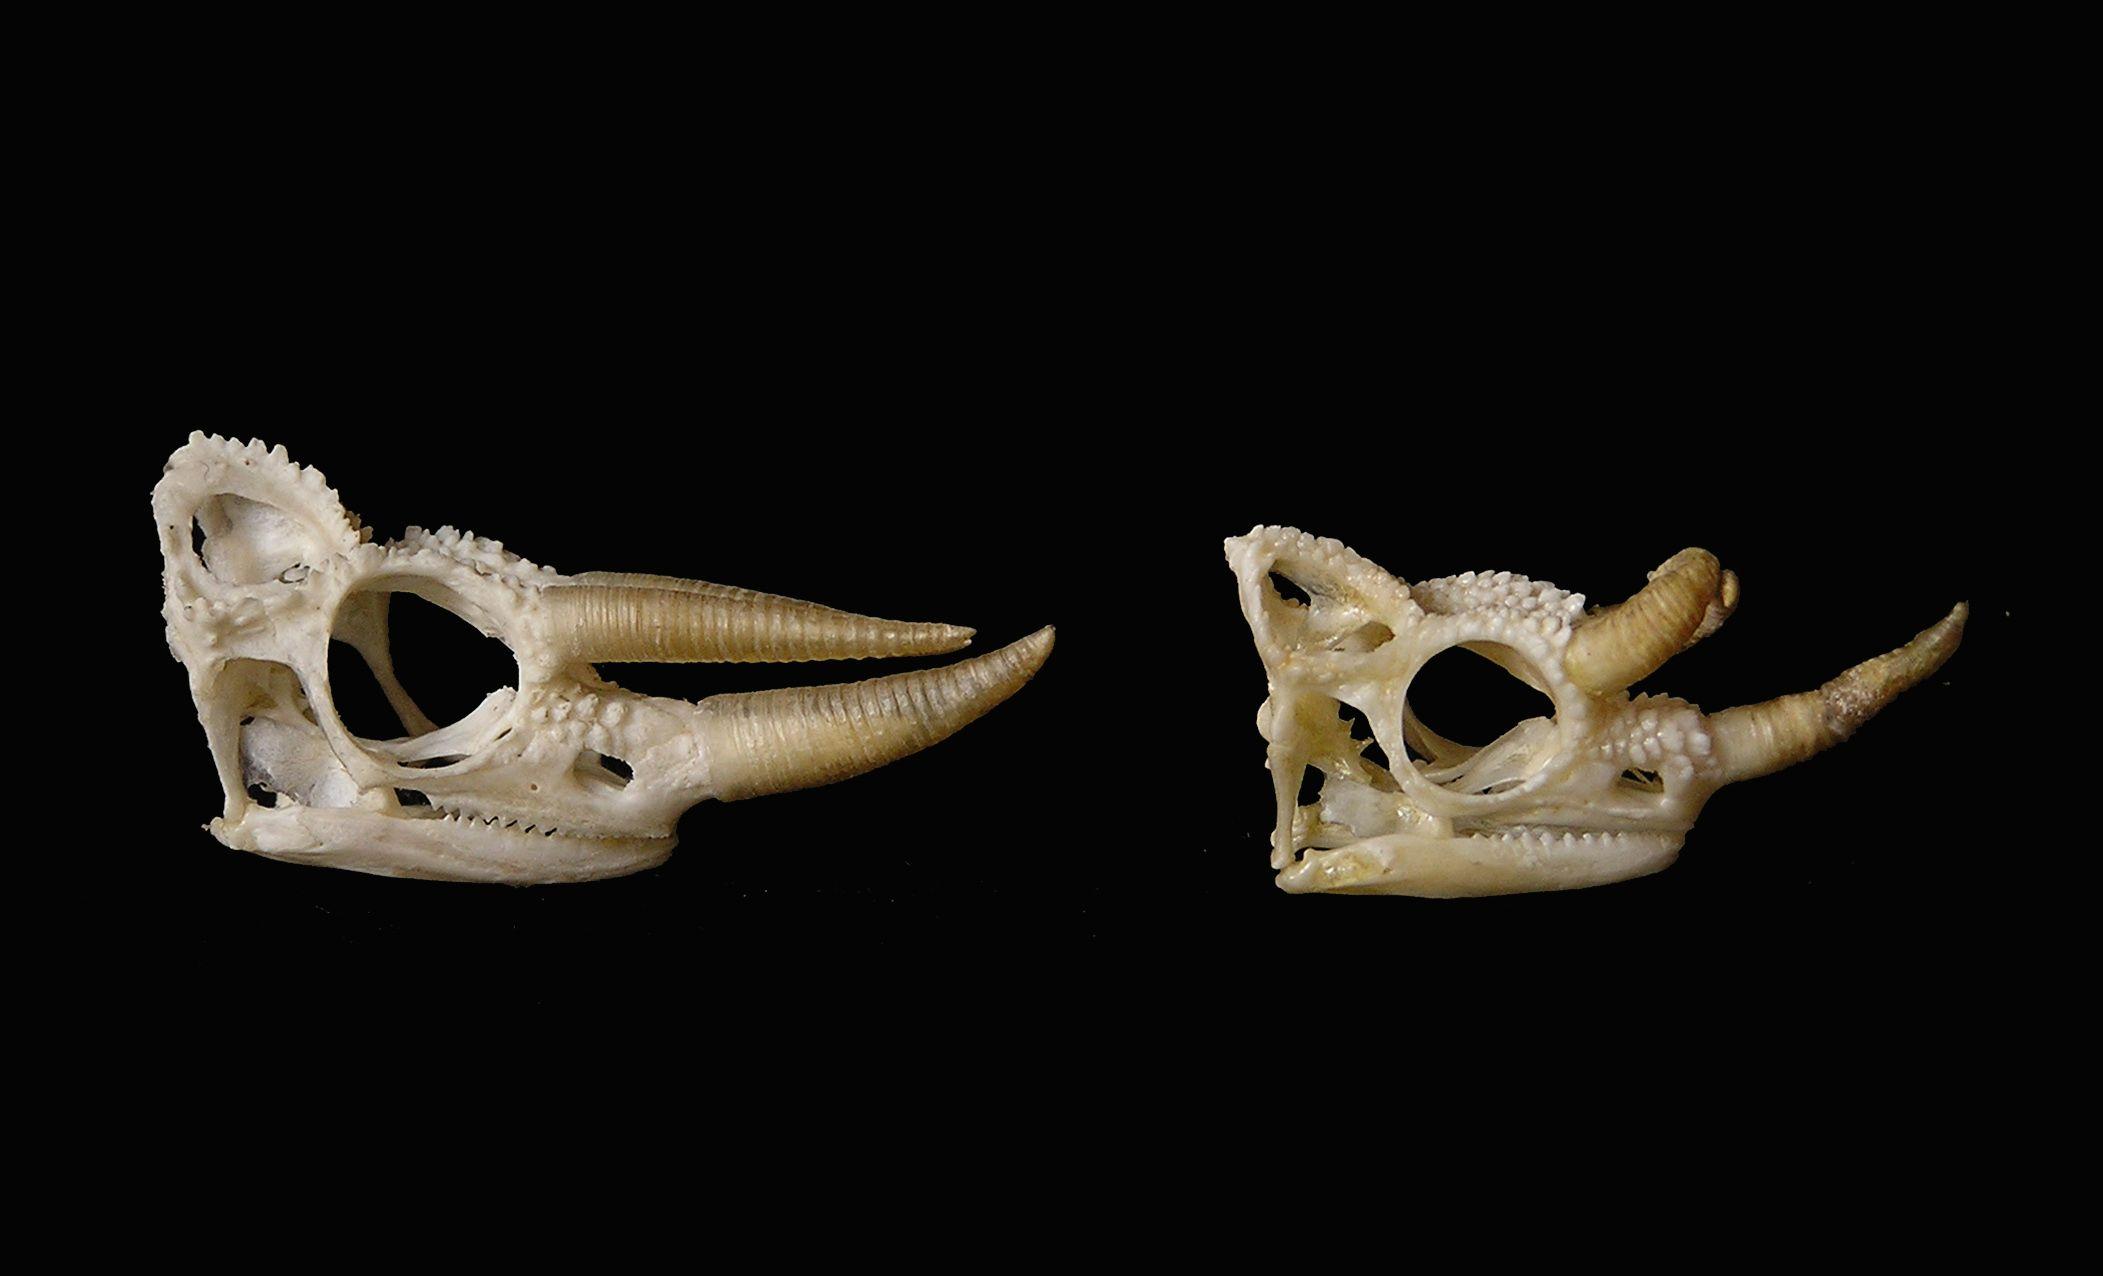 skull of triocerops jacksonii a chameleon art